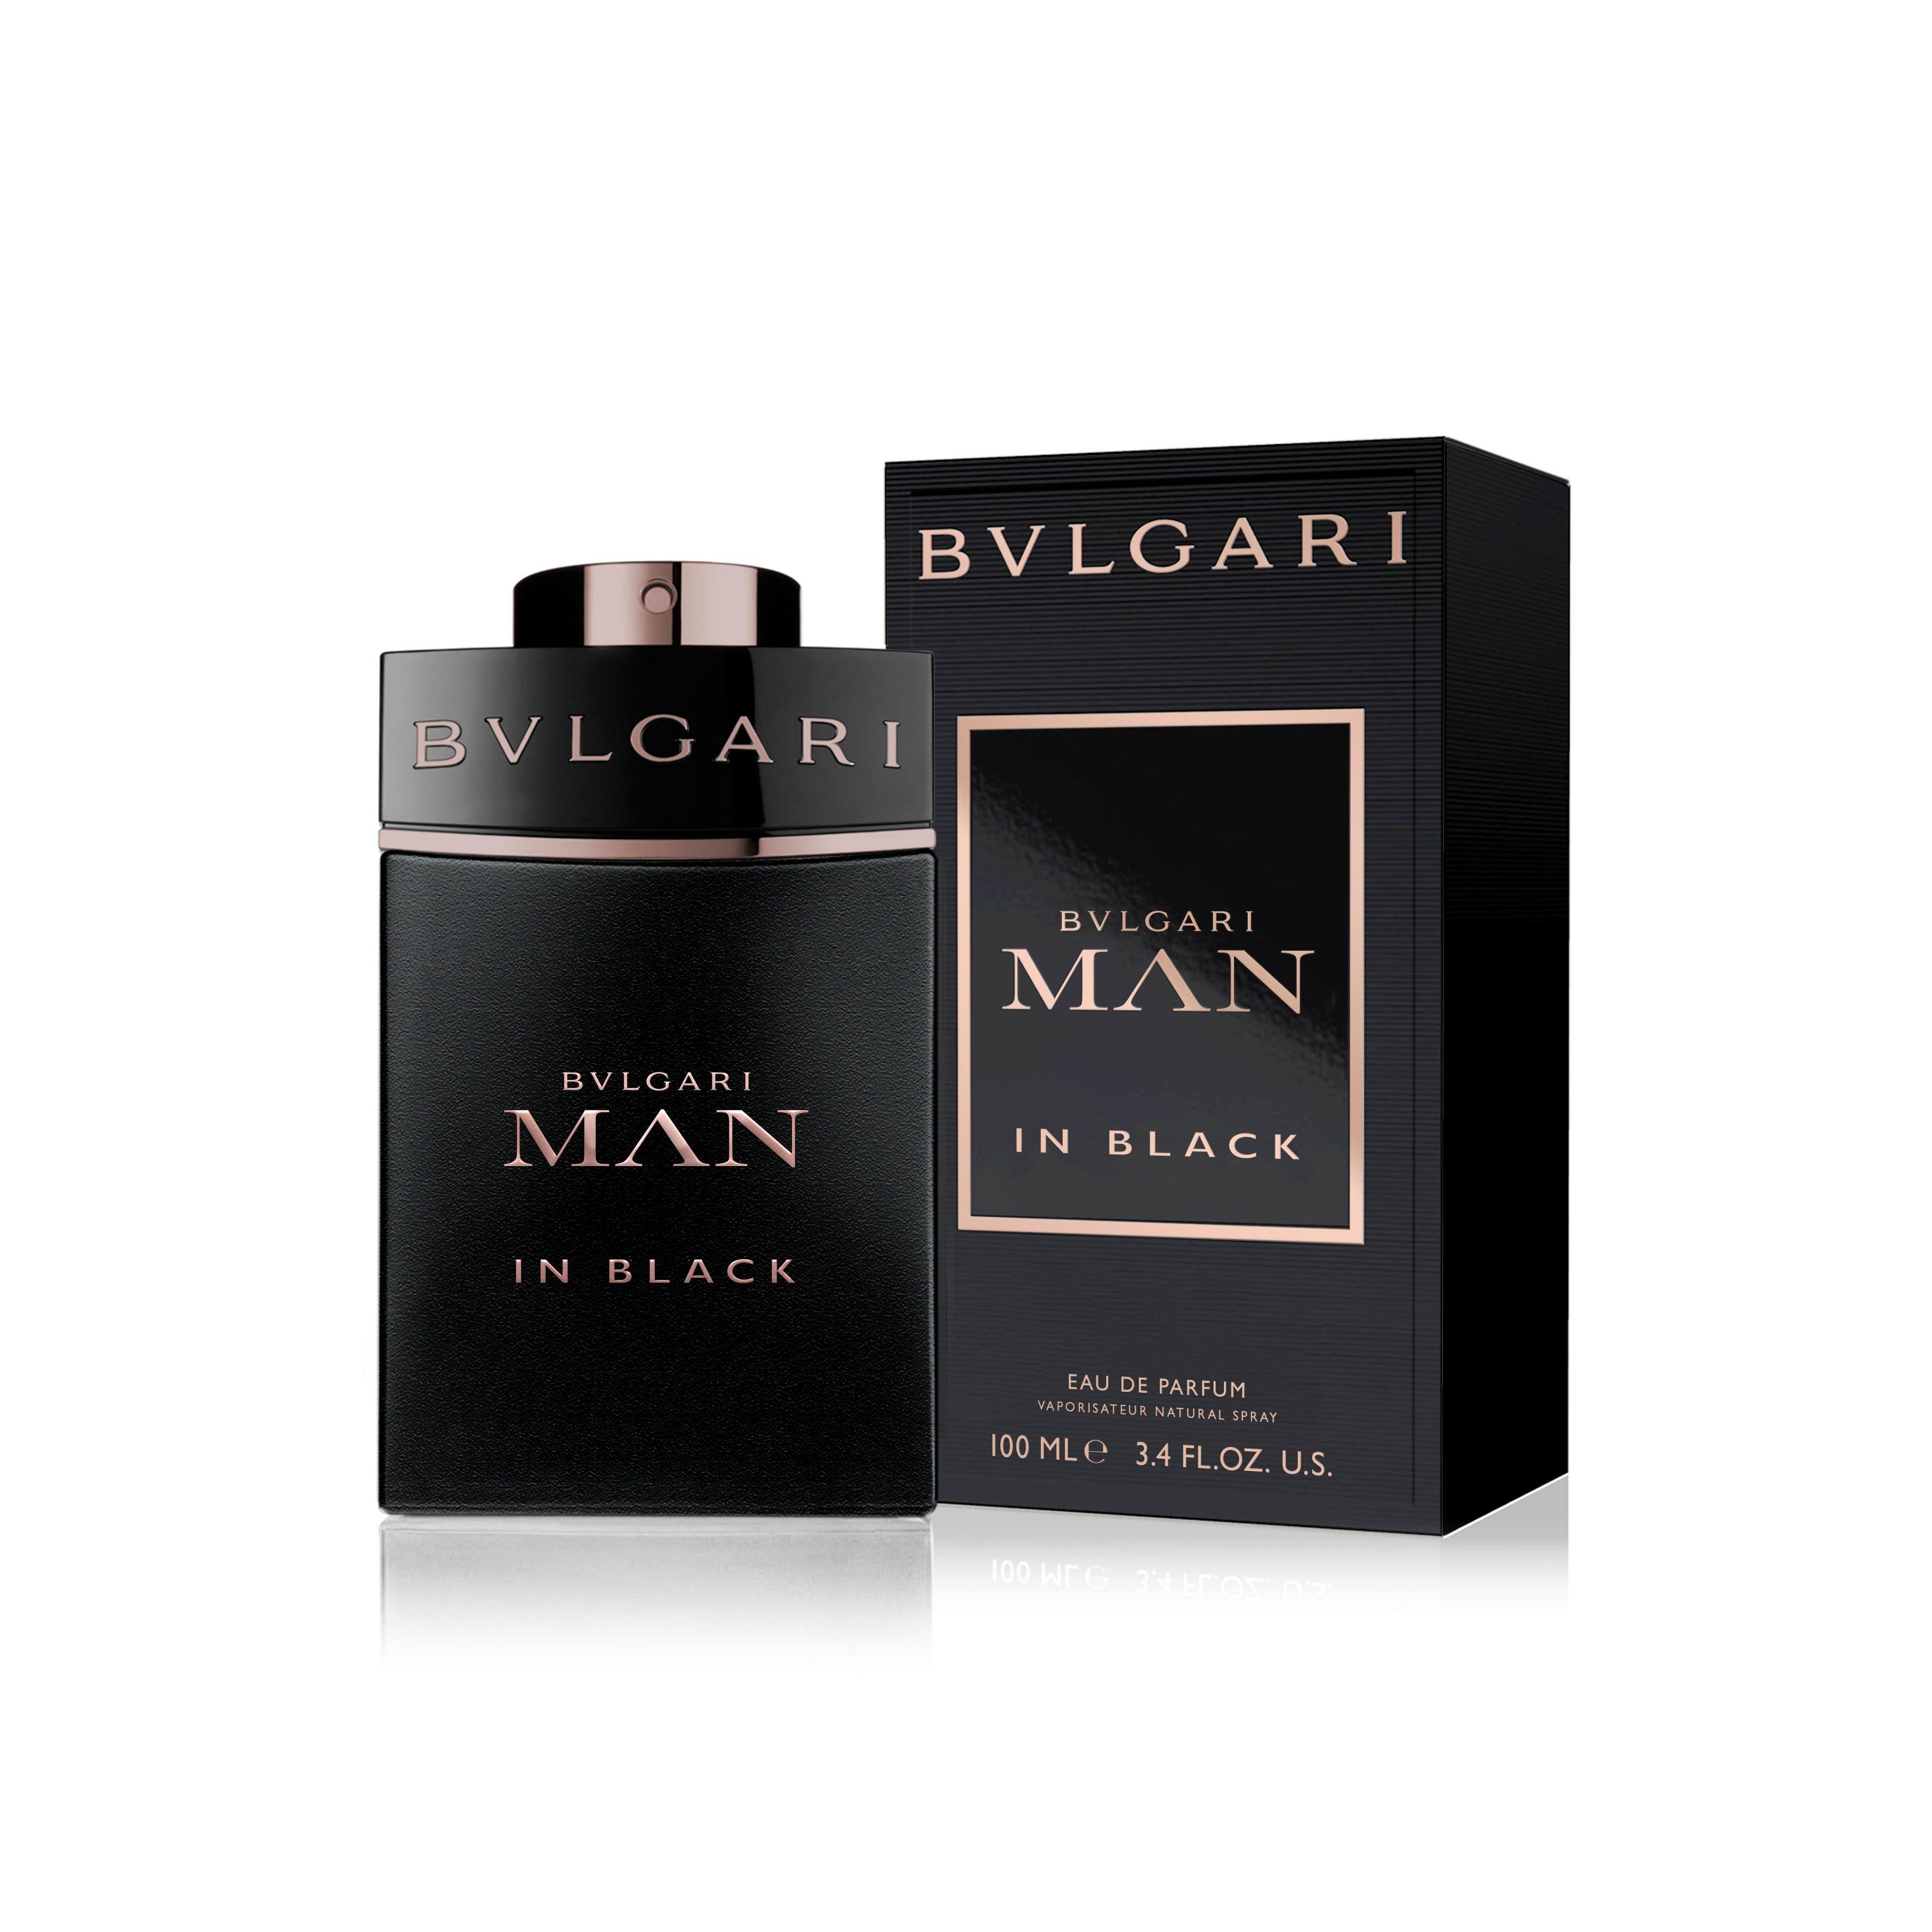 Bvlgari Man In Black From Www Delionparfum Com Parfum Sprays Men In Black